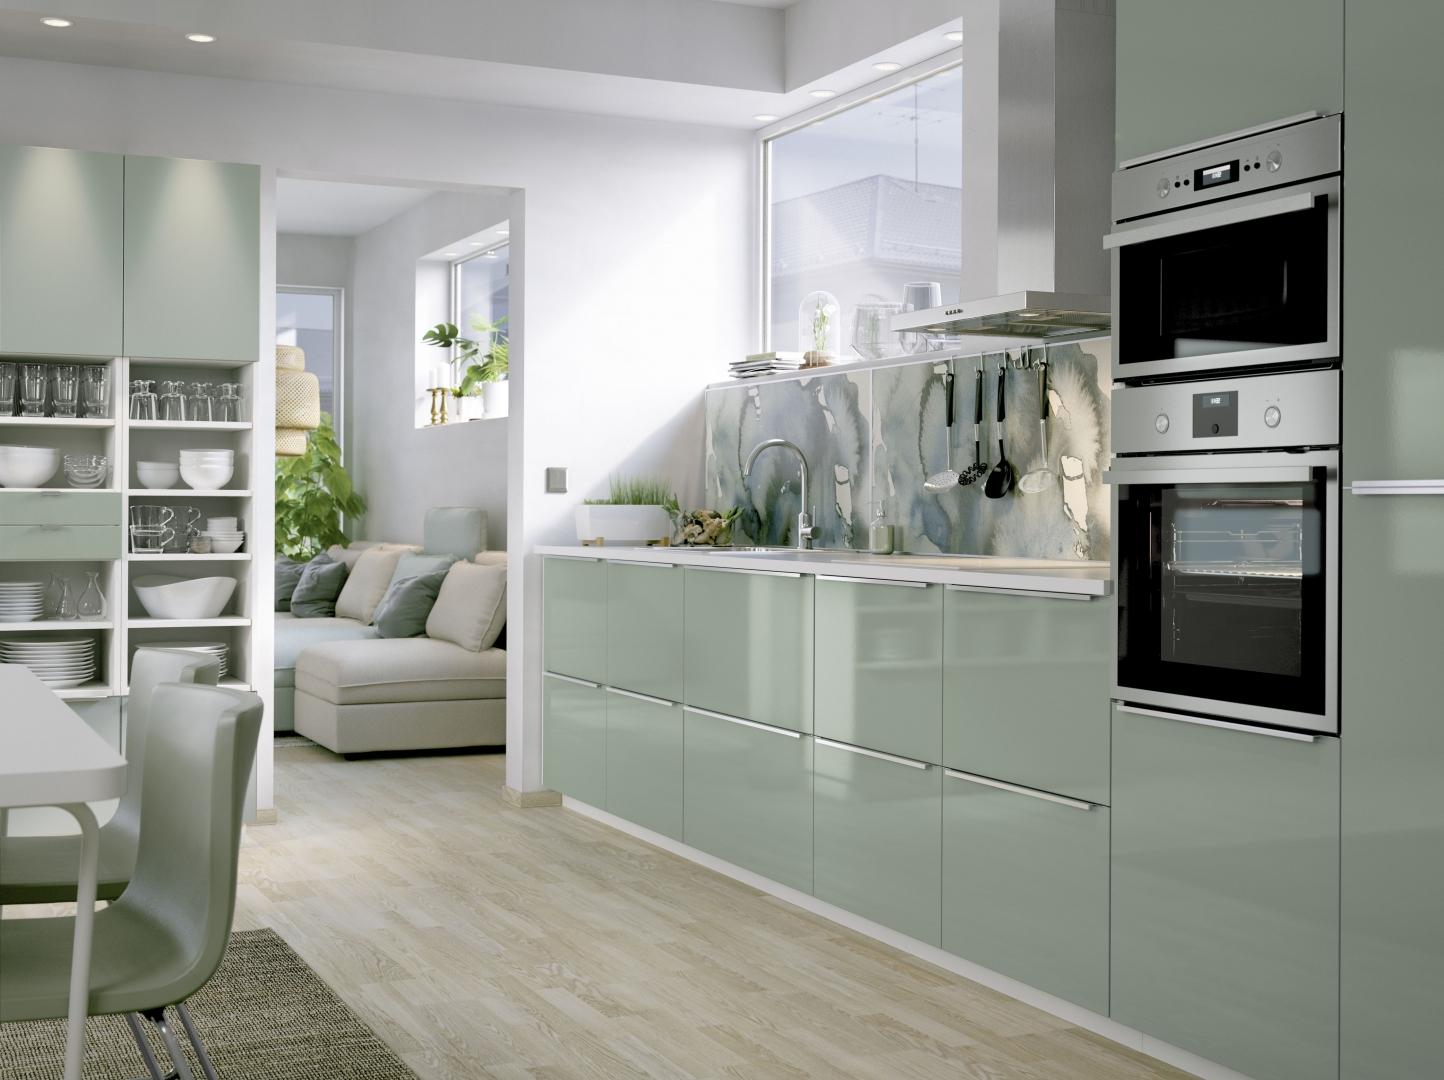 Ikea Keuken Abstrakt Grijs : Interieur Ikea lanceert design keuken met karakter ? Stijlvol